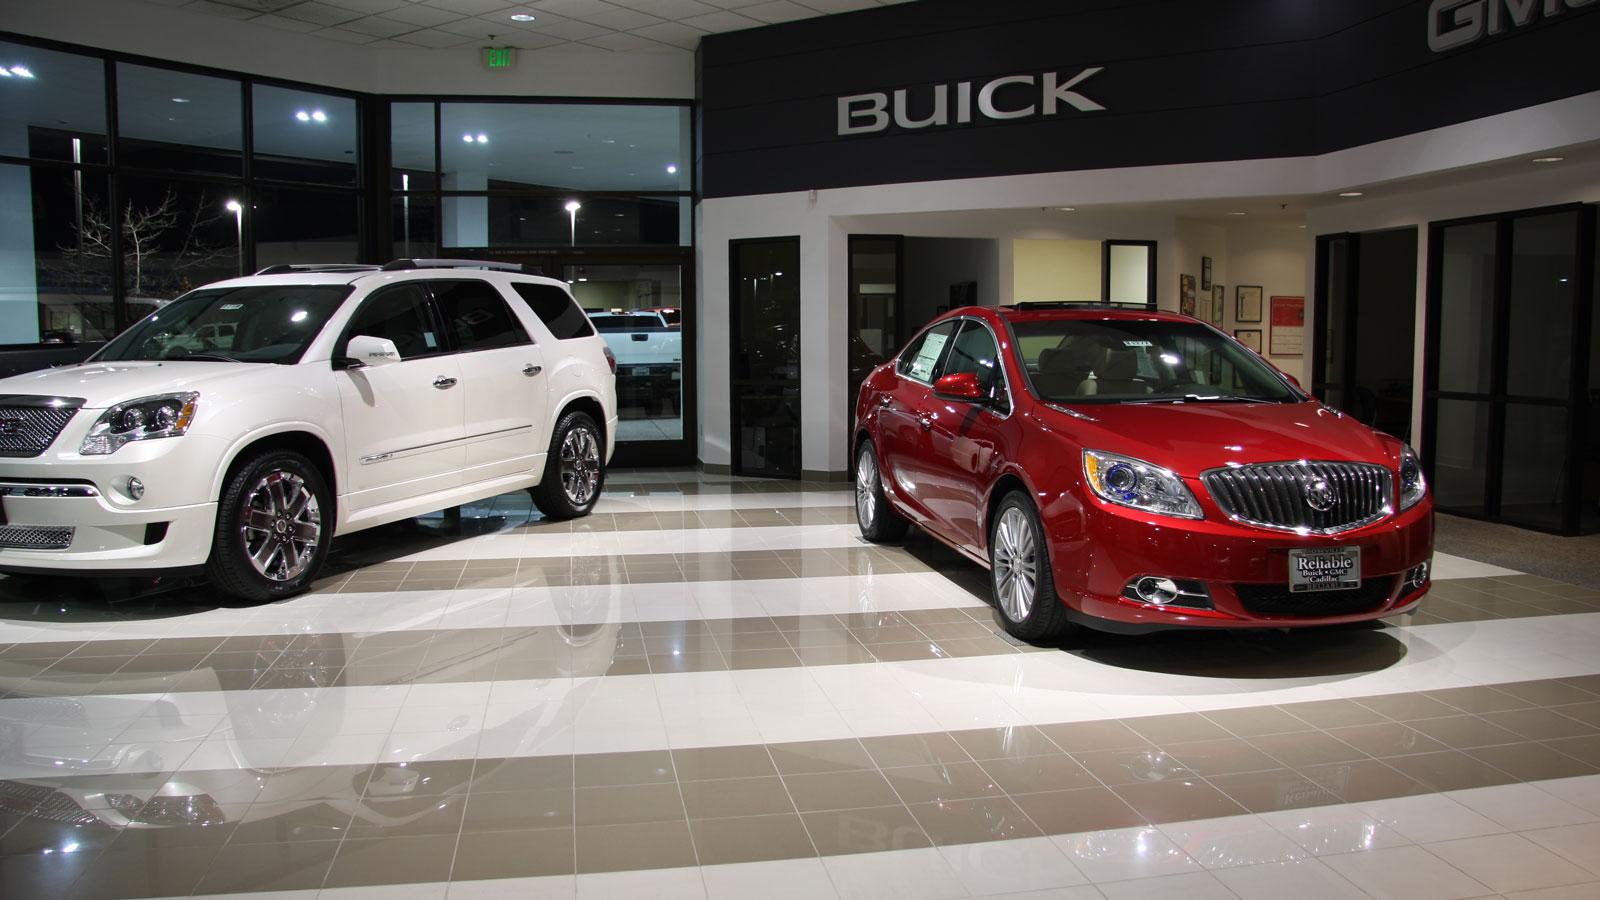 About architectural lighting design for car dealership ...